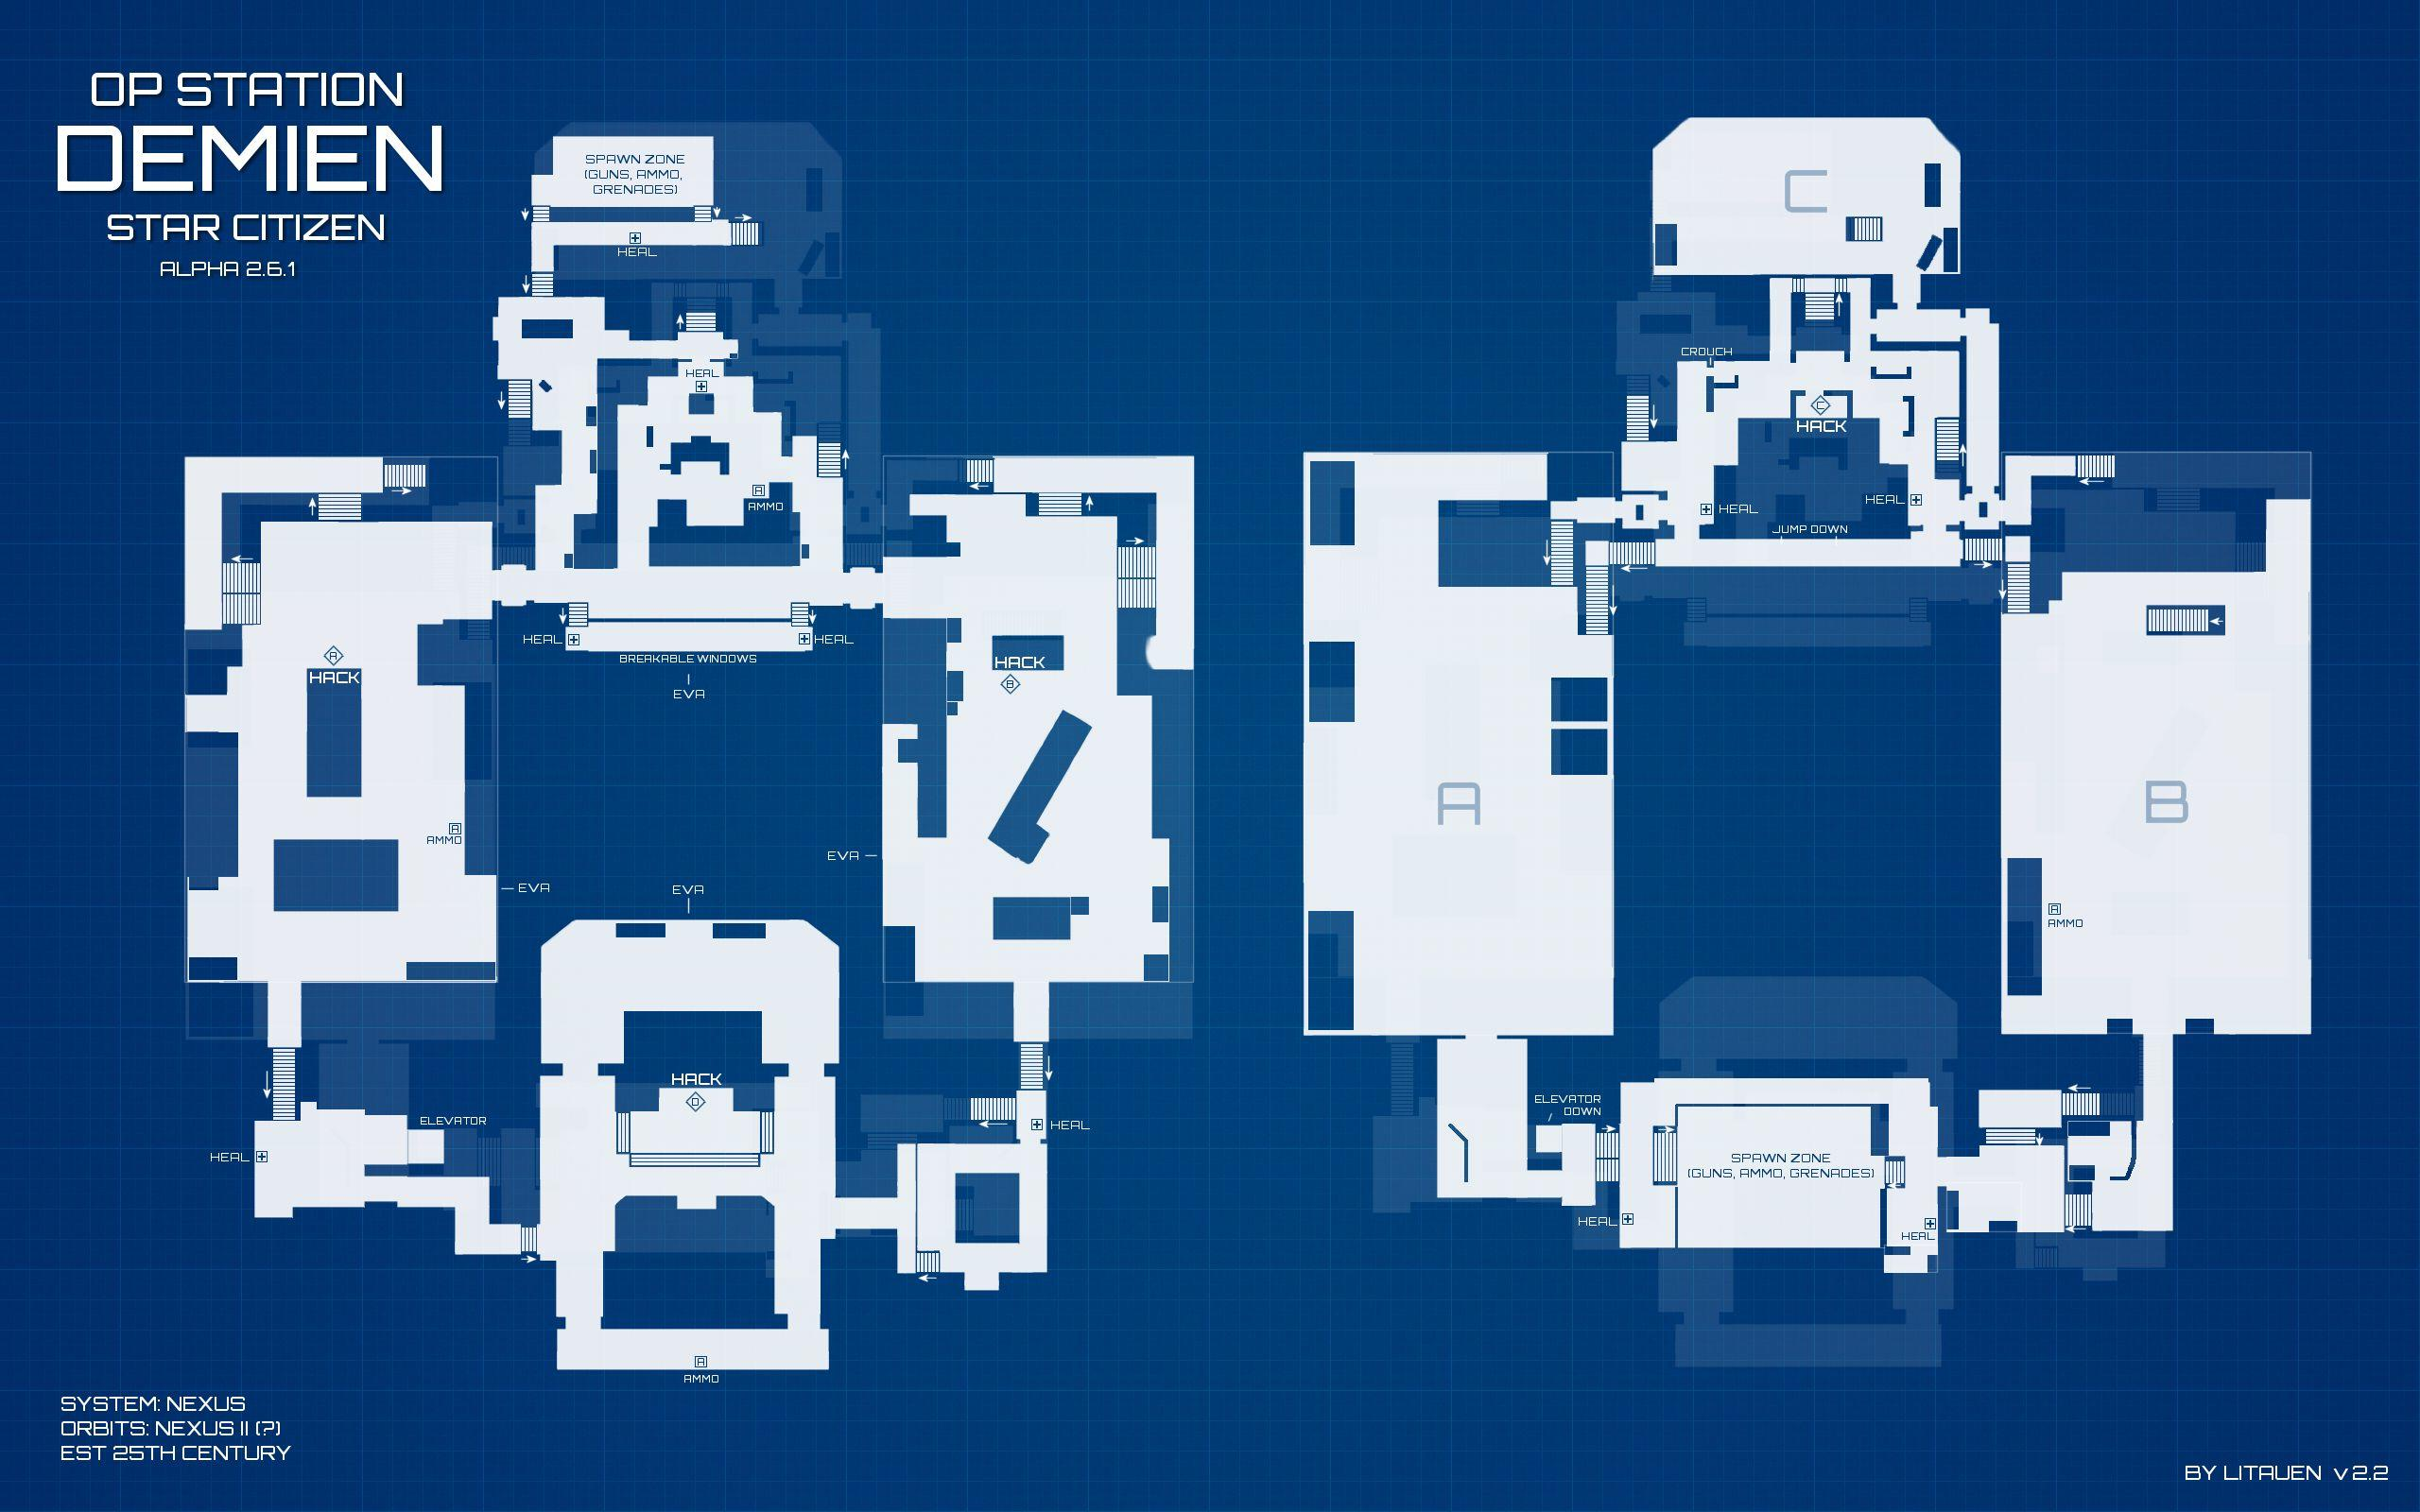 Star Marine Op Station Demien - mapa